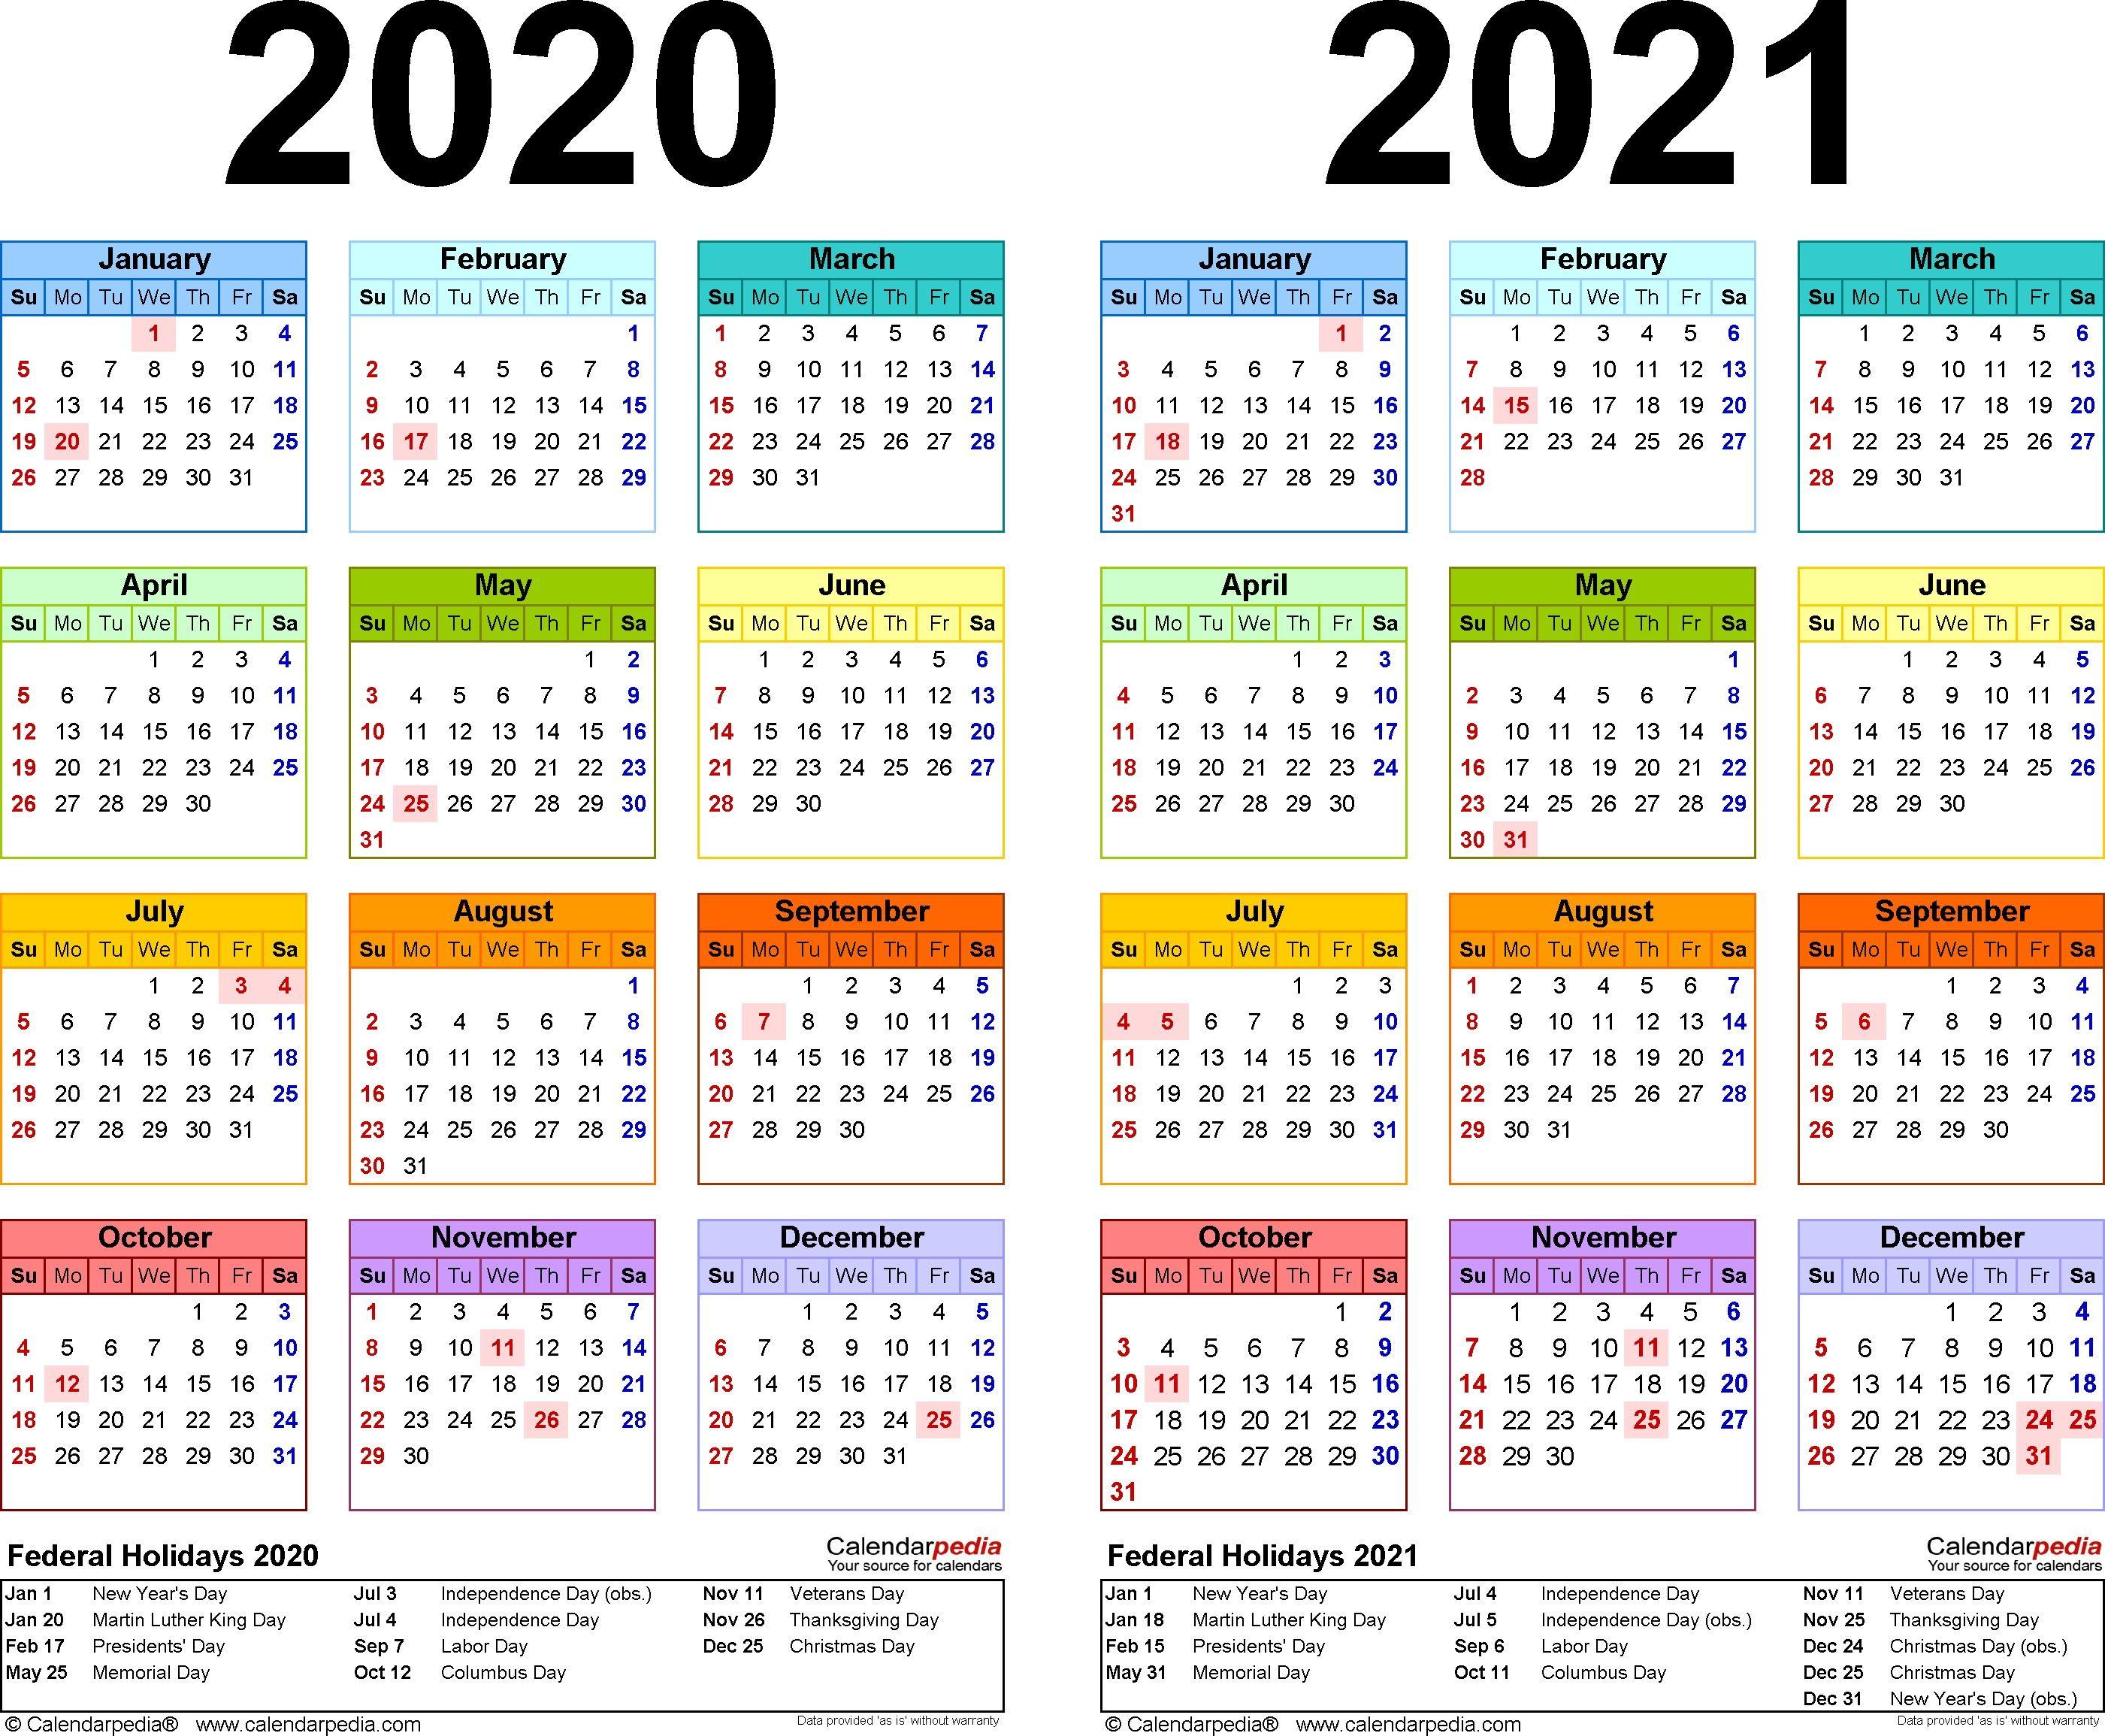 2020 21 Calendar Printable In 2020 Printable Calendar Design Calendar Printables School Calendar